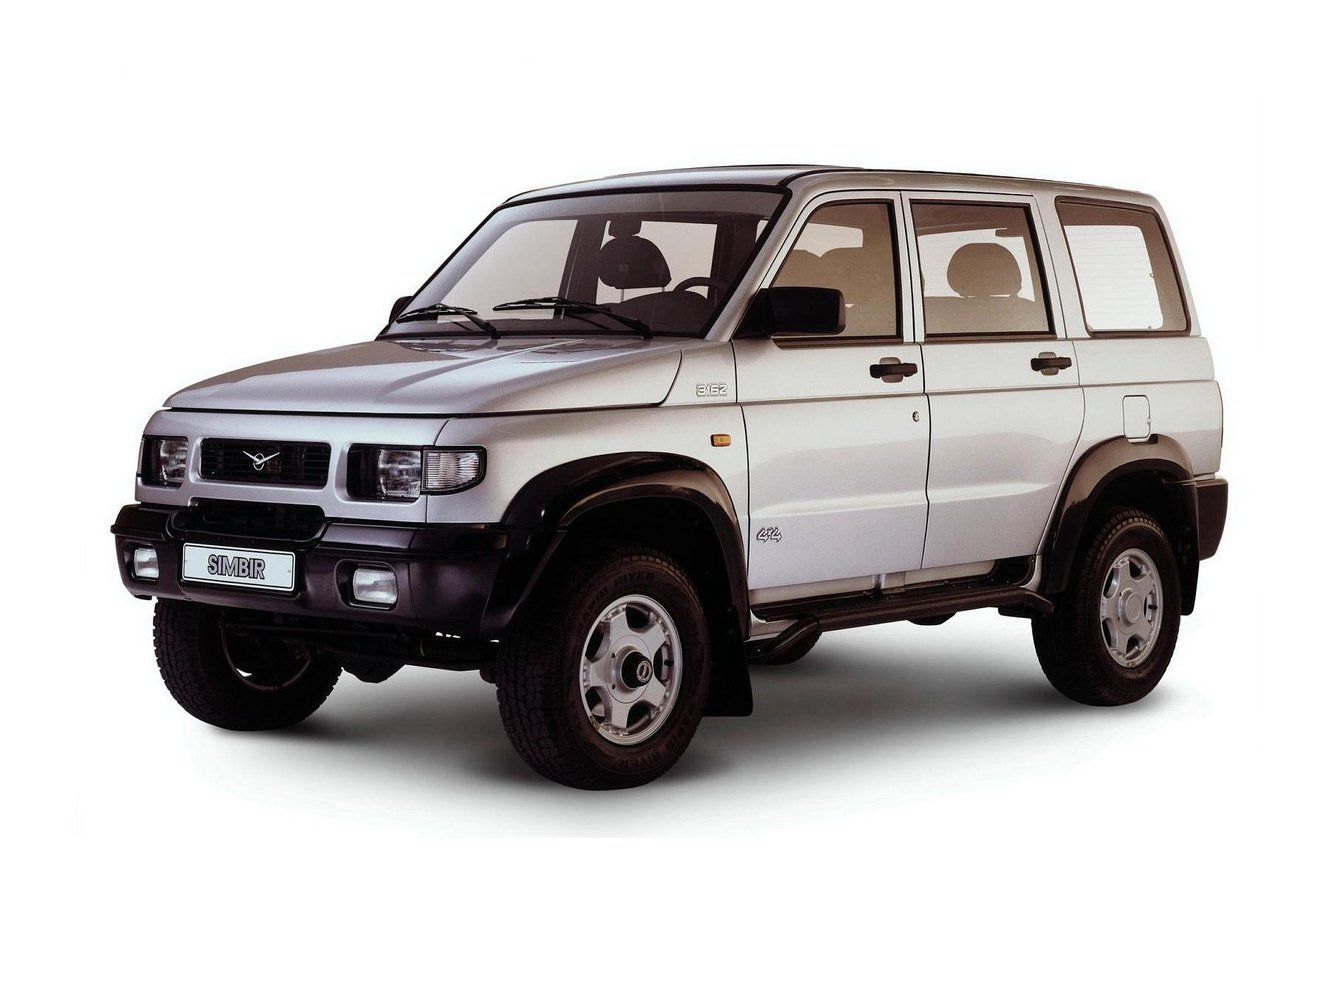 uaz УАЗ 3162 Simbir